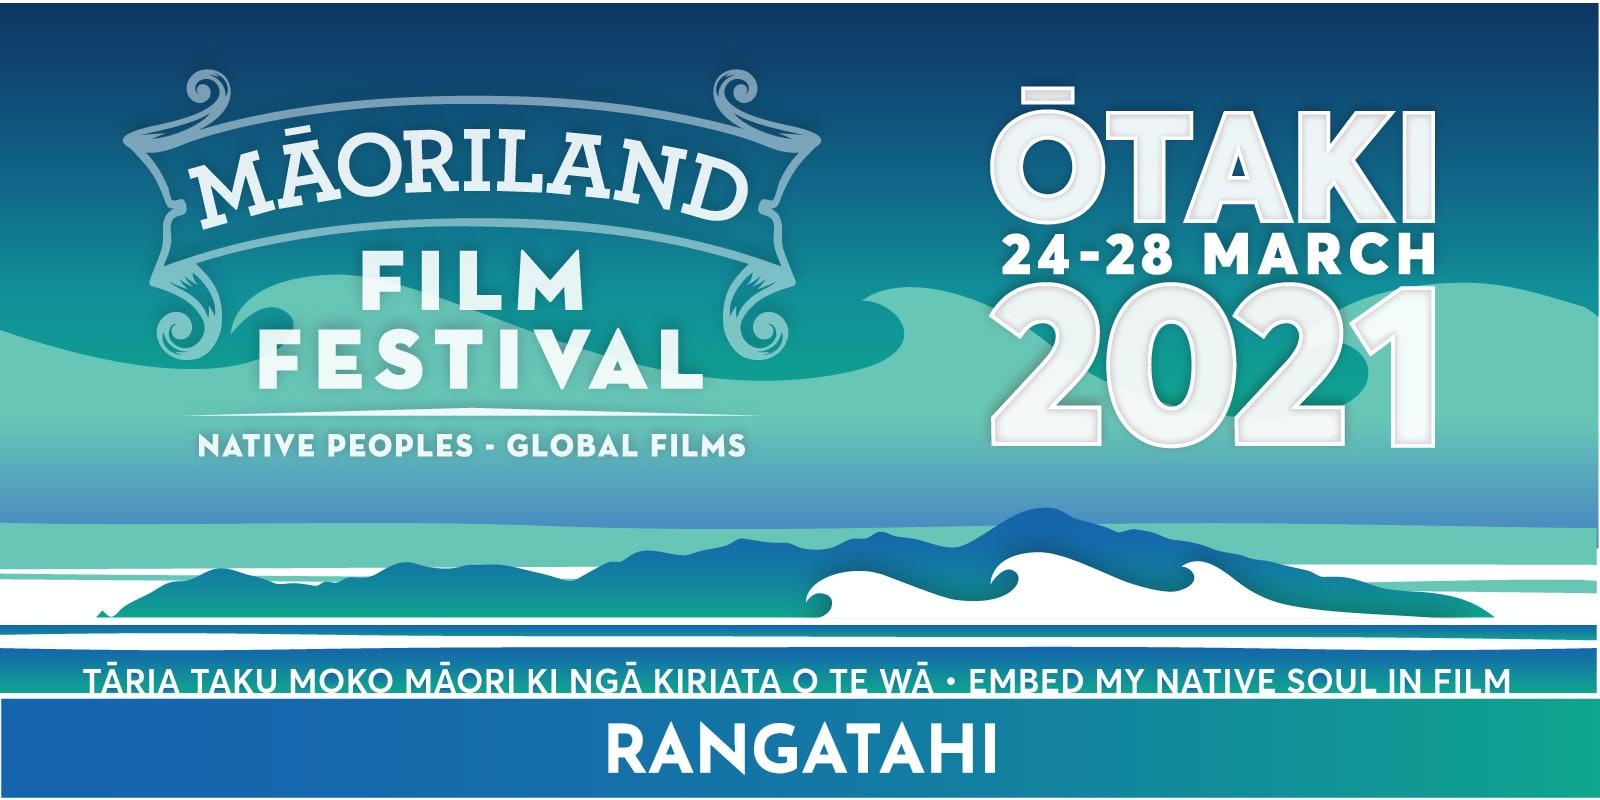 MAORILAND FILM FESTIVAL 2021 | Maoriland Rangatahi Film Festival - Schools